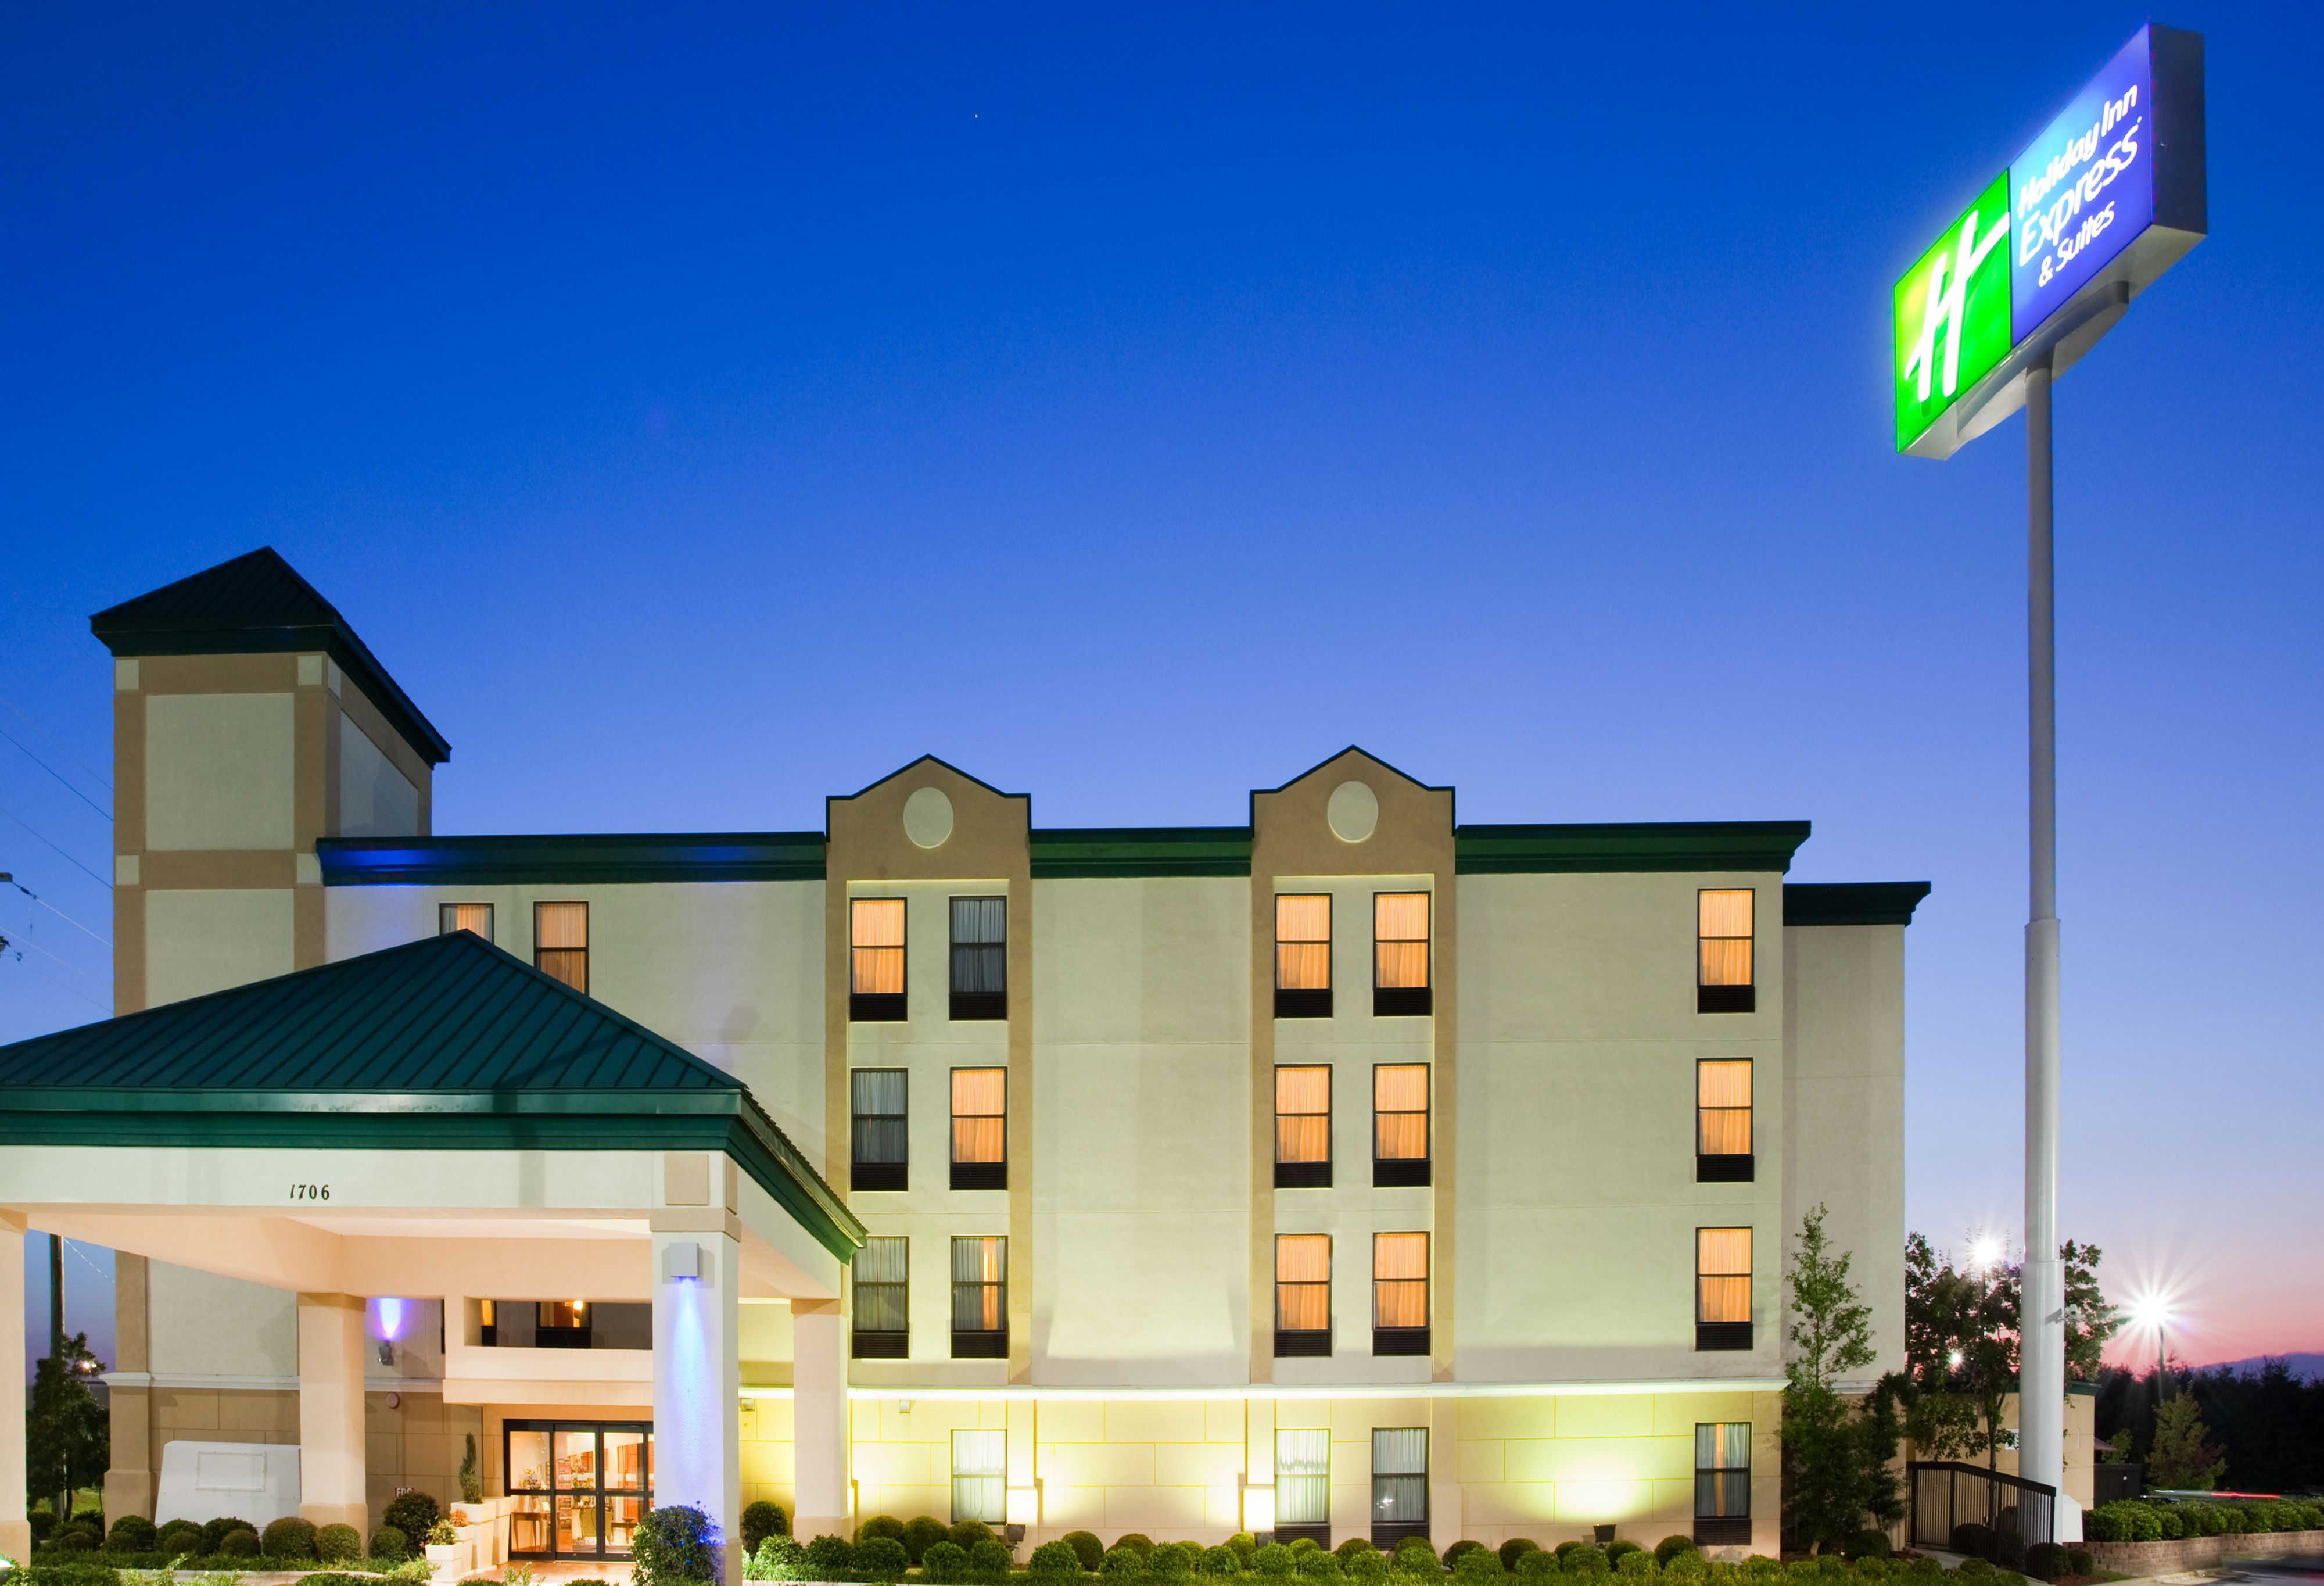 Holiday Inn Express Suites Farmington Bloomfield Coupons Farmington Nm Near Me 8coupons